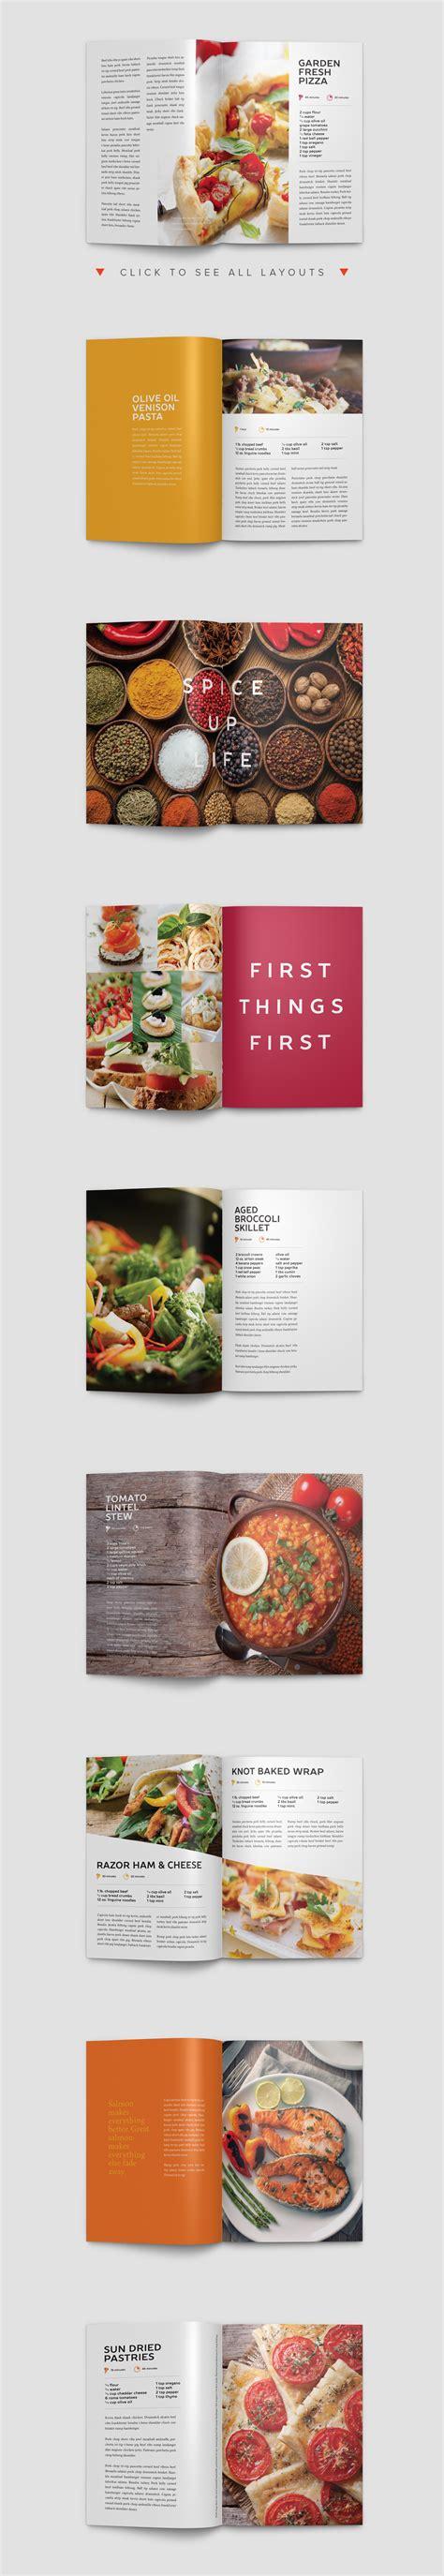 cookbook layout template cookbooktemplate previews 3 o jpg 1439226173